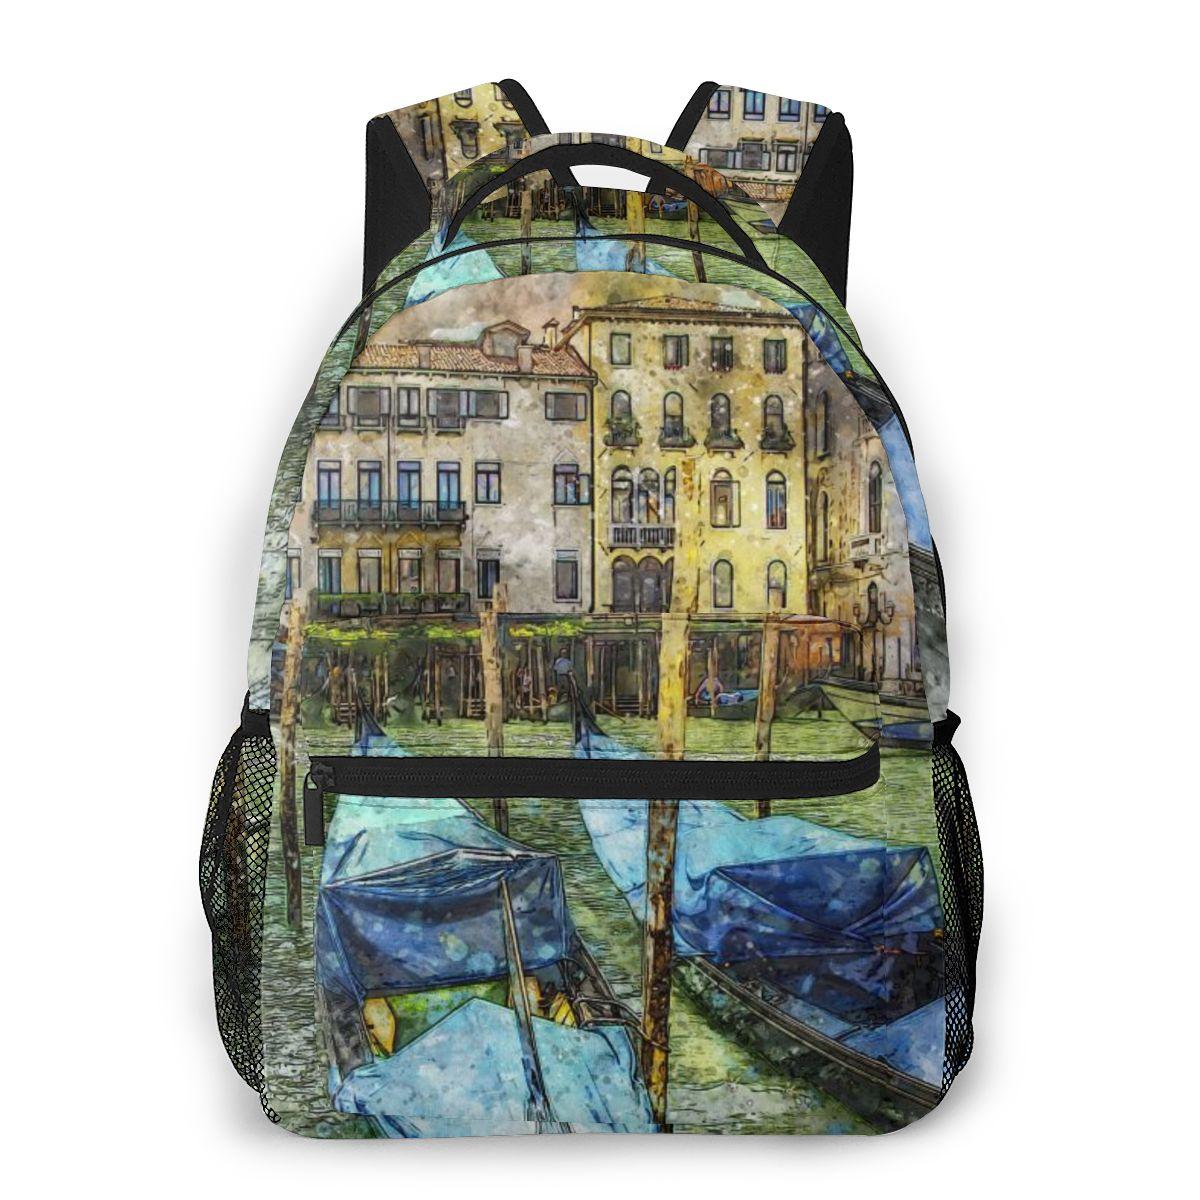 Fashion Backpack Women Men Unisex Students Backpacks Venice Venetian Evening Gondola Canal Italy Travel bag Bookbag